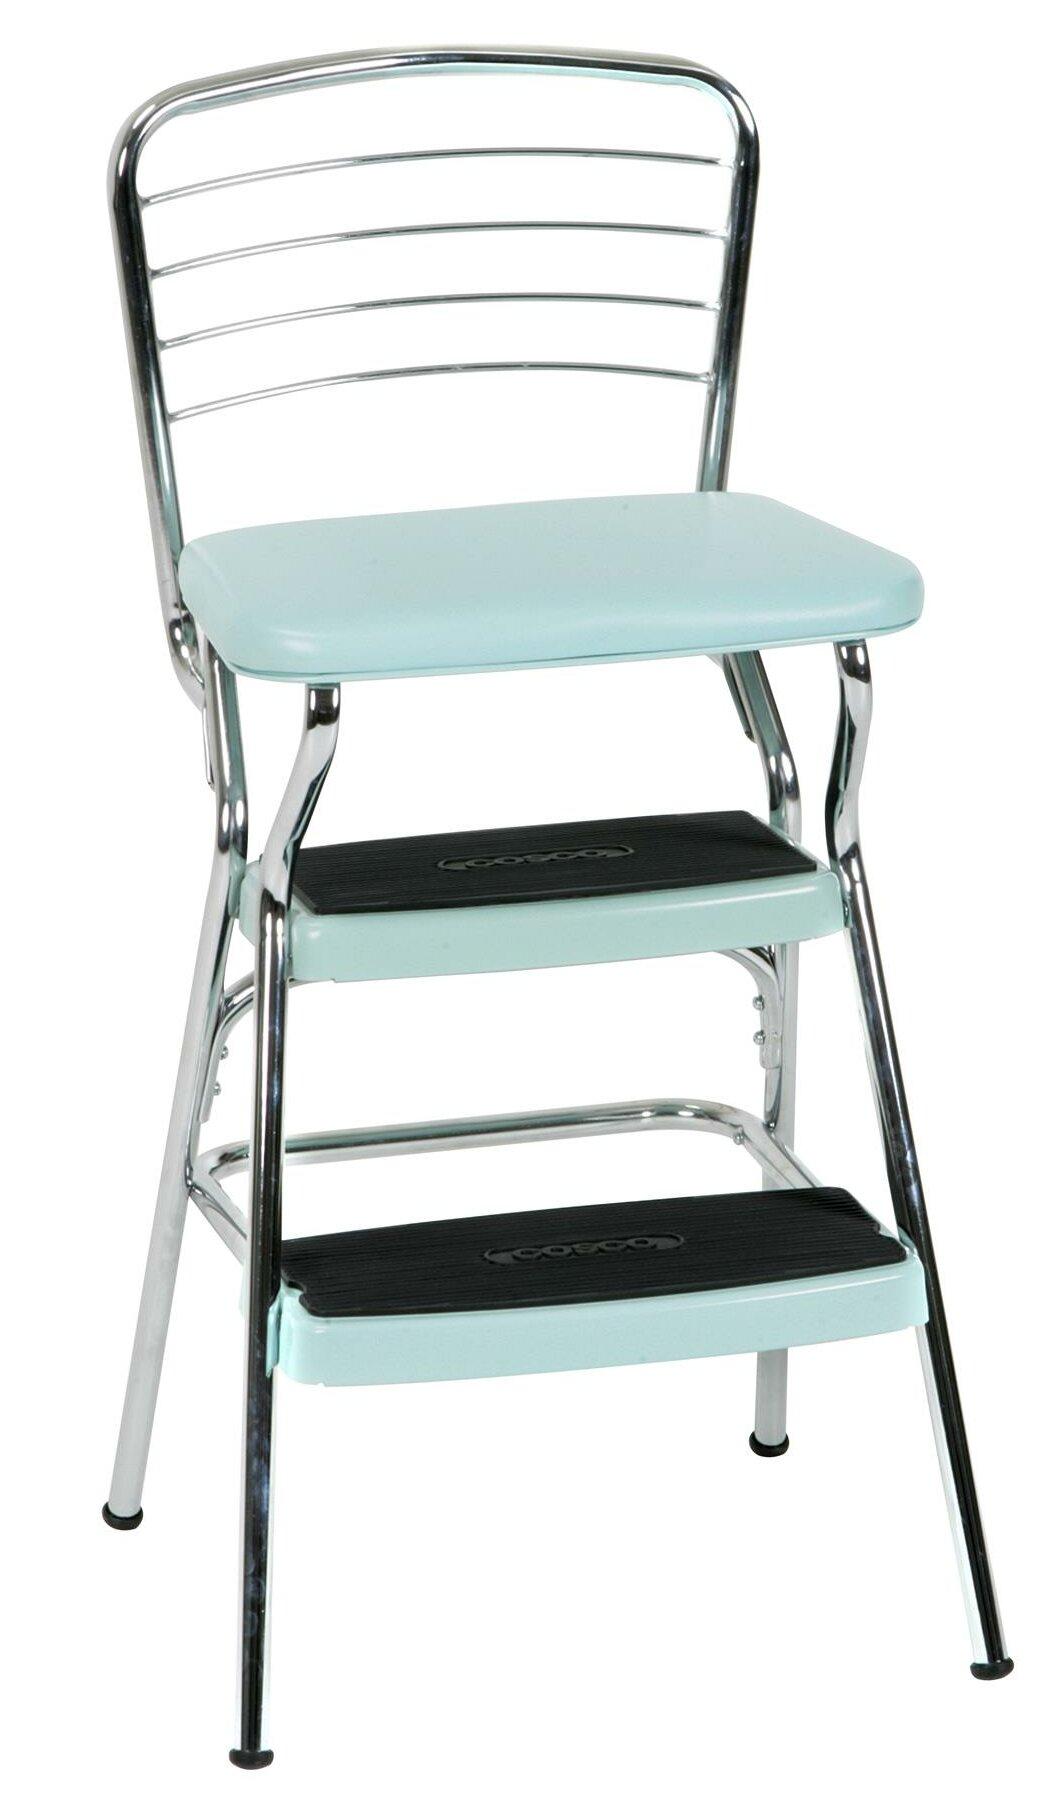 Tremendous Thorson 3 Step Steel Step Stool Evergreenethics Interior Chair Design Evergreenethicsorg